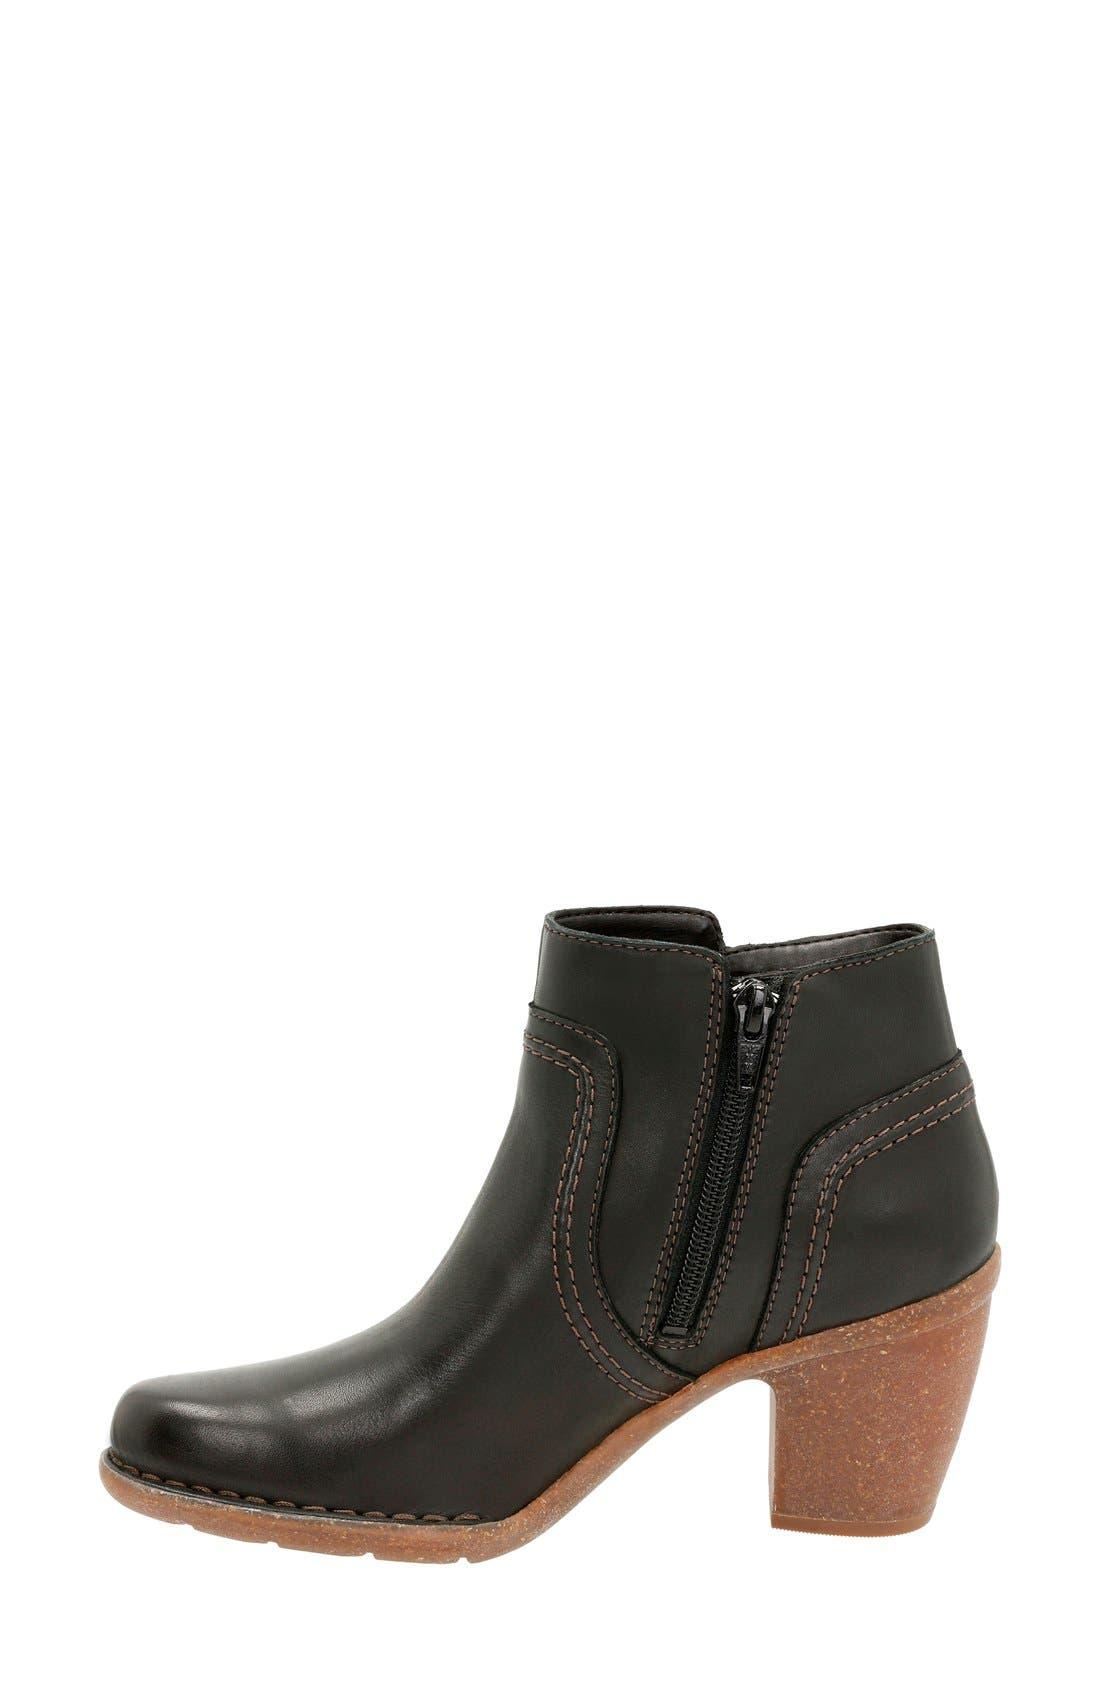 'Carleta Paris' Ankle Boot,                             Alternate thumbnail 3, color,